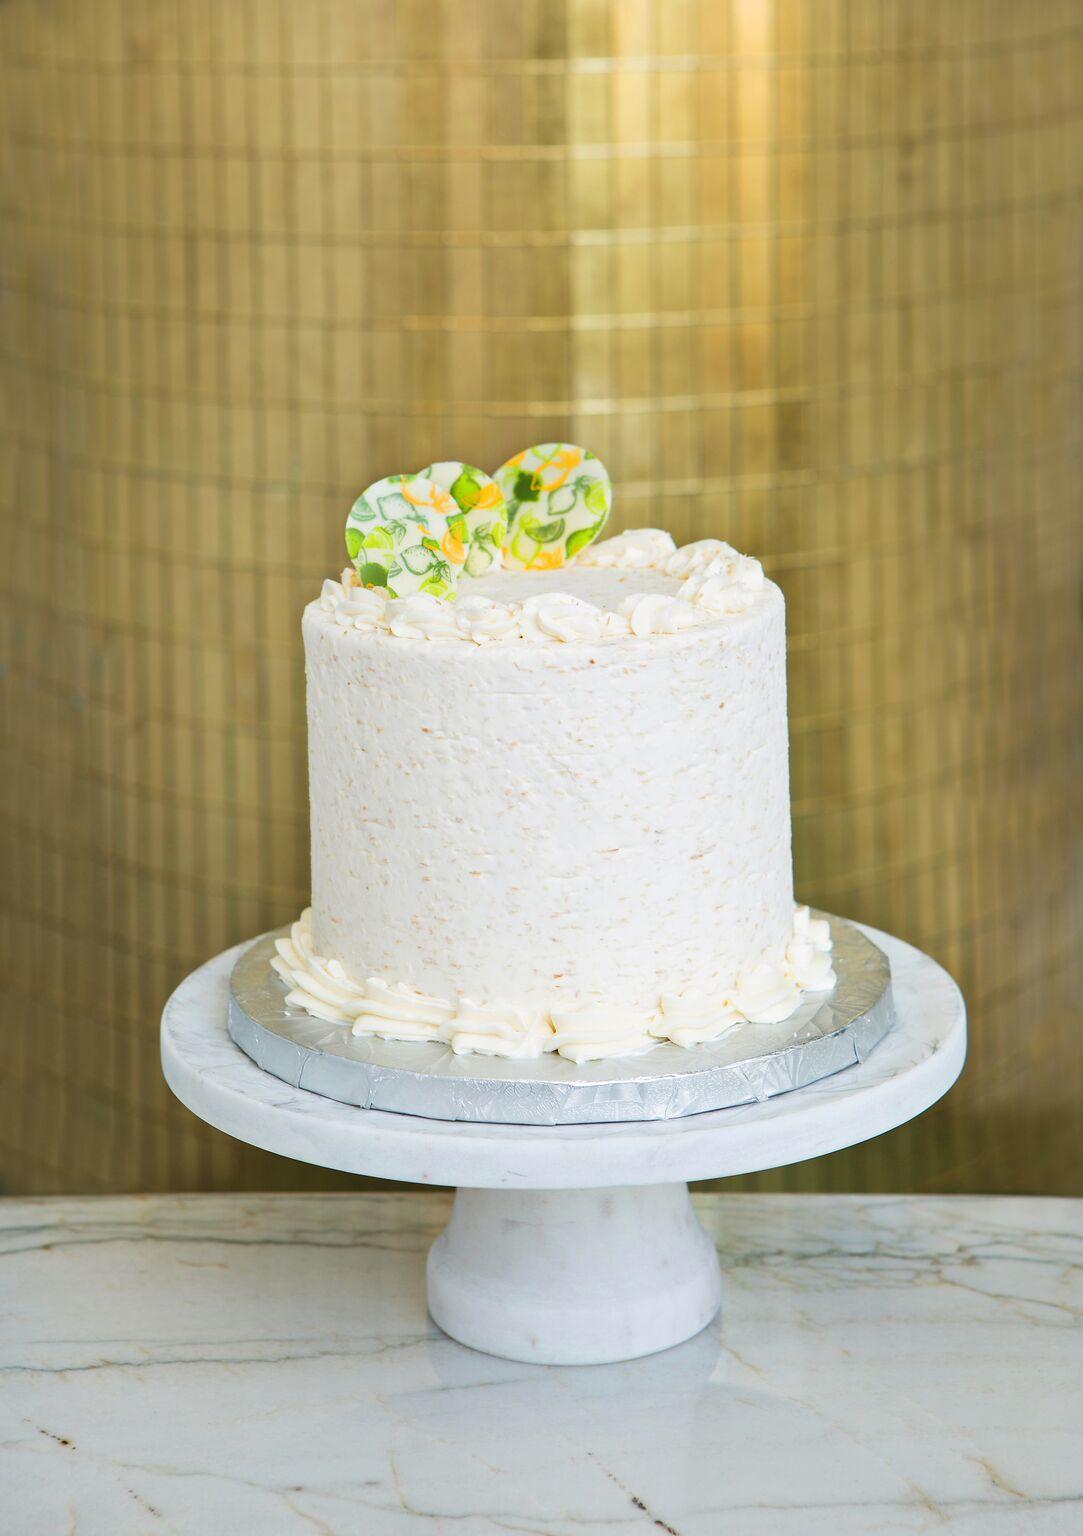 Cake - Key Lime Coconut #SweetnessAtChezBonBon #Miami #Fontainebleau